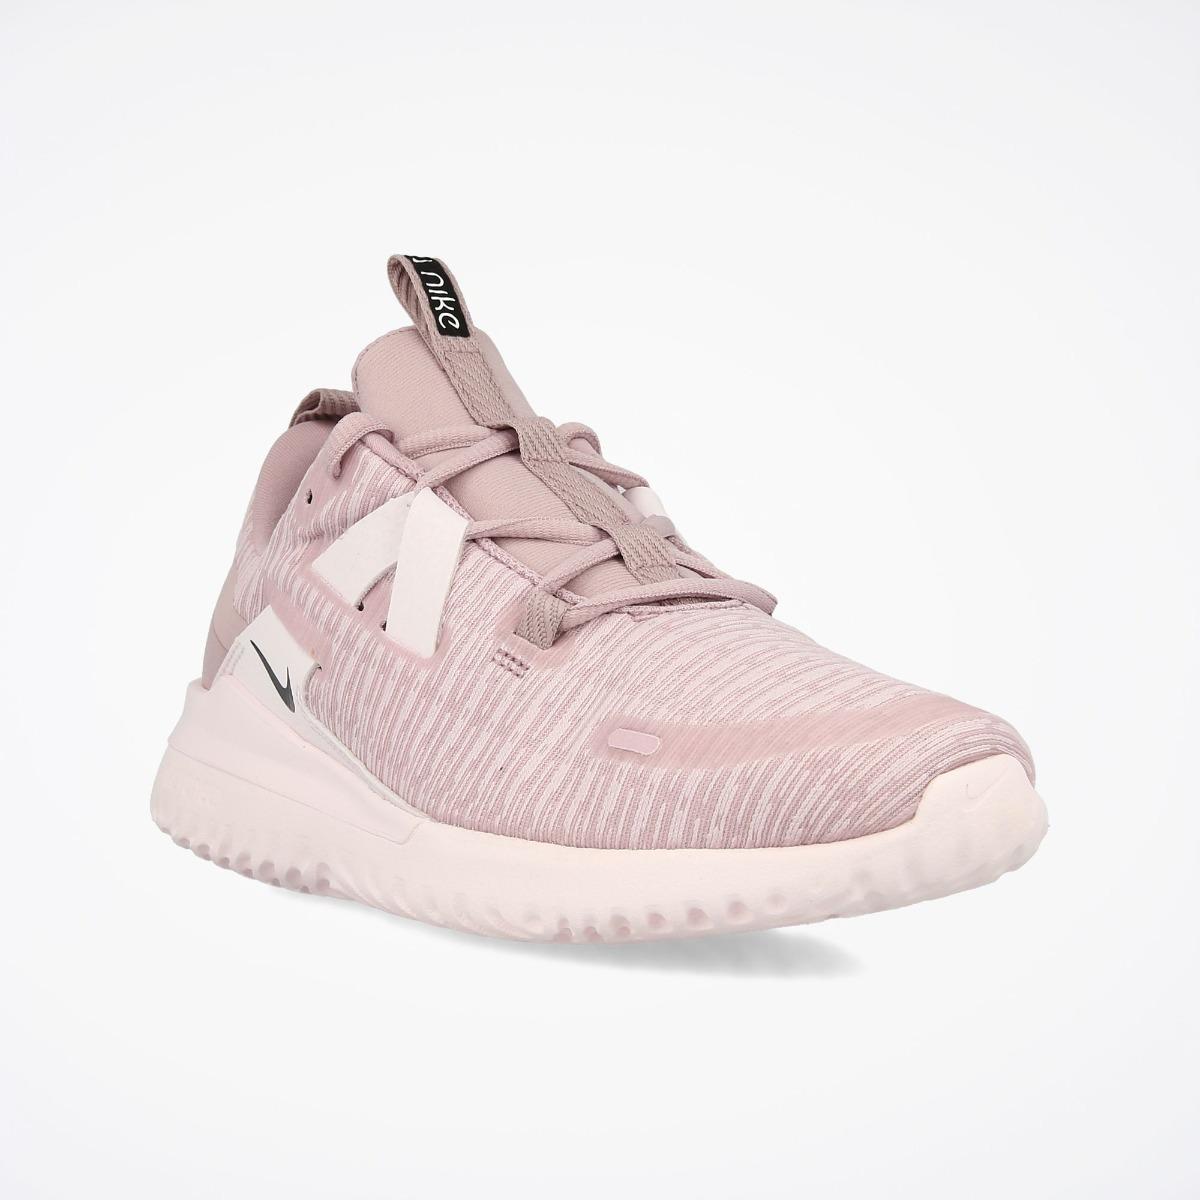 NIKE ARENA MUJER: Zapatillas Nike Mujer Renew ARENA 500